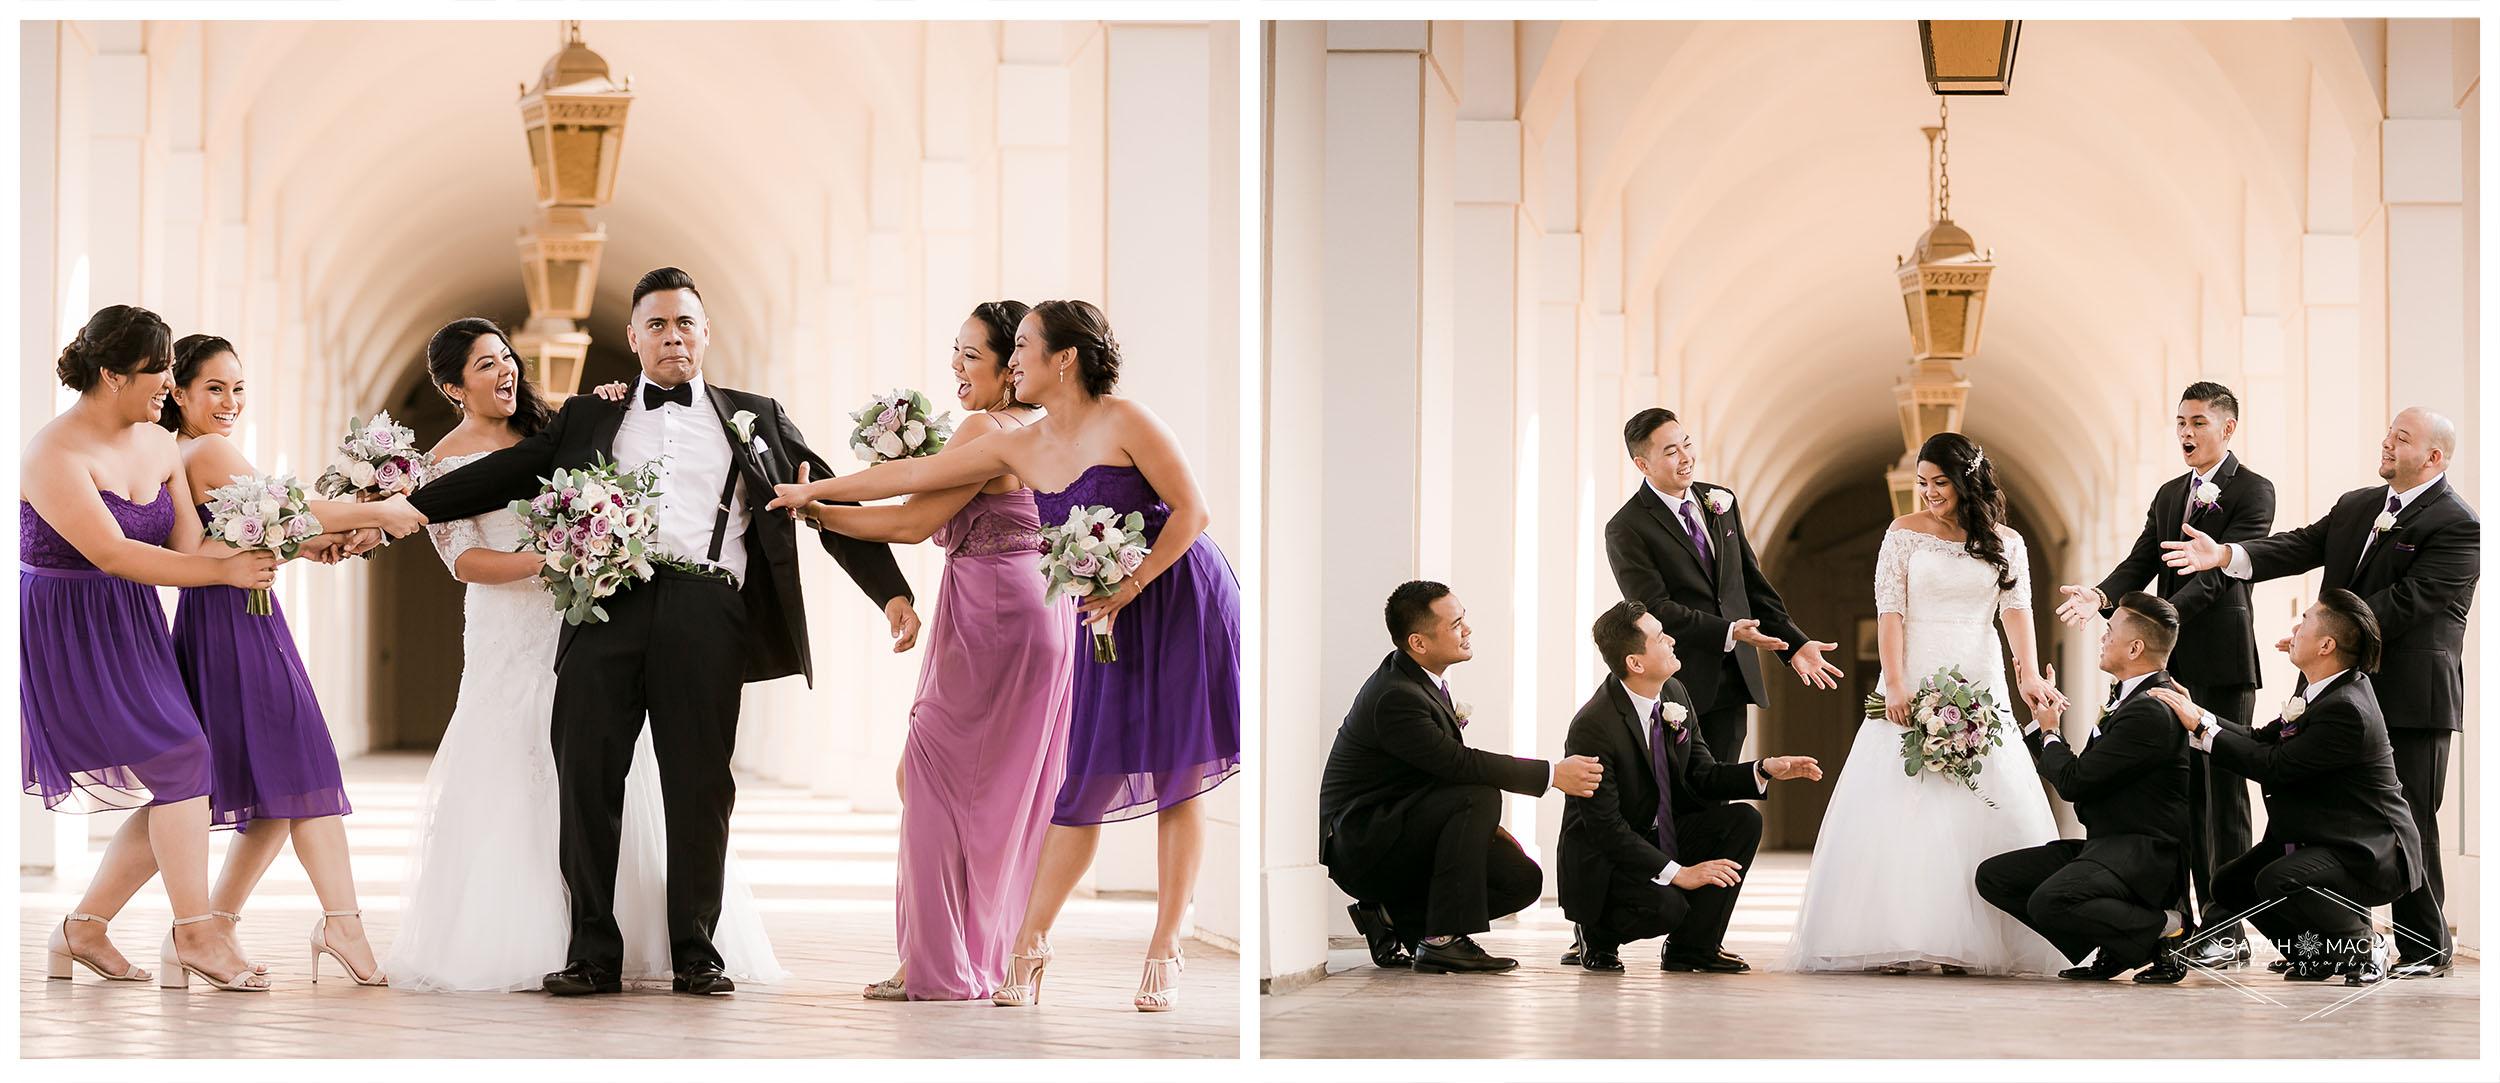 SR_Saint-Andrews-Pasadena-Wedding-Photography-46.jpg